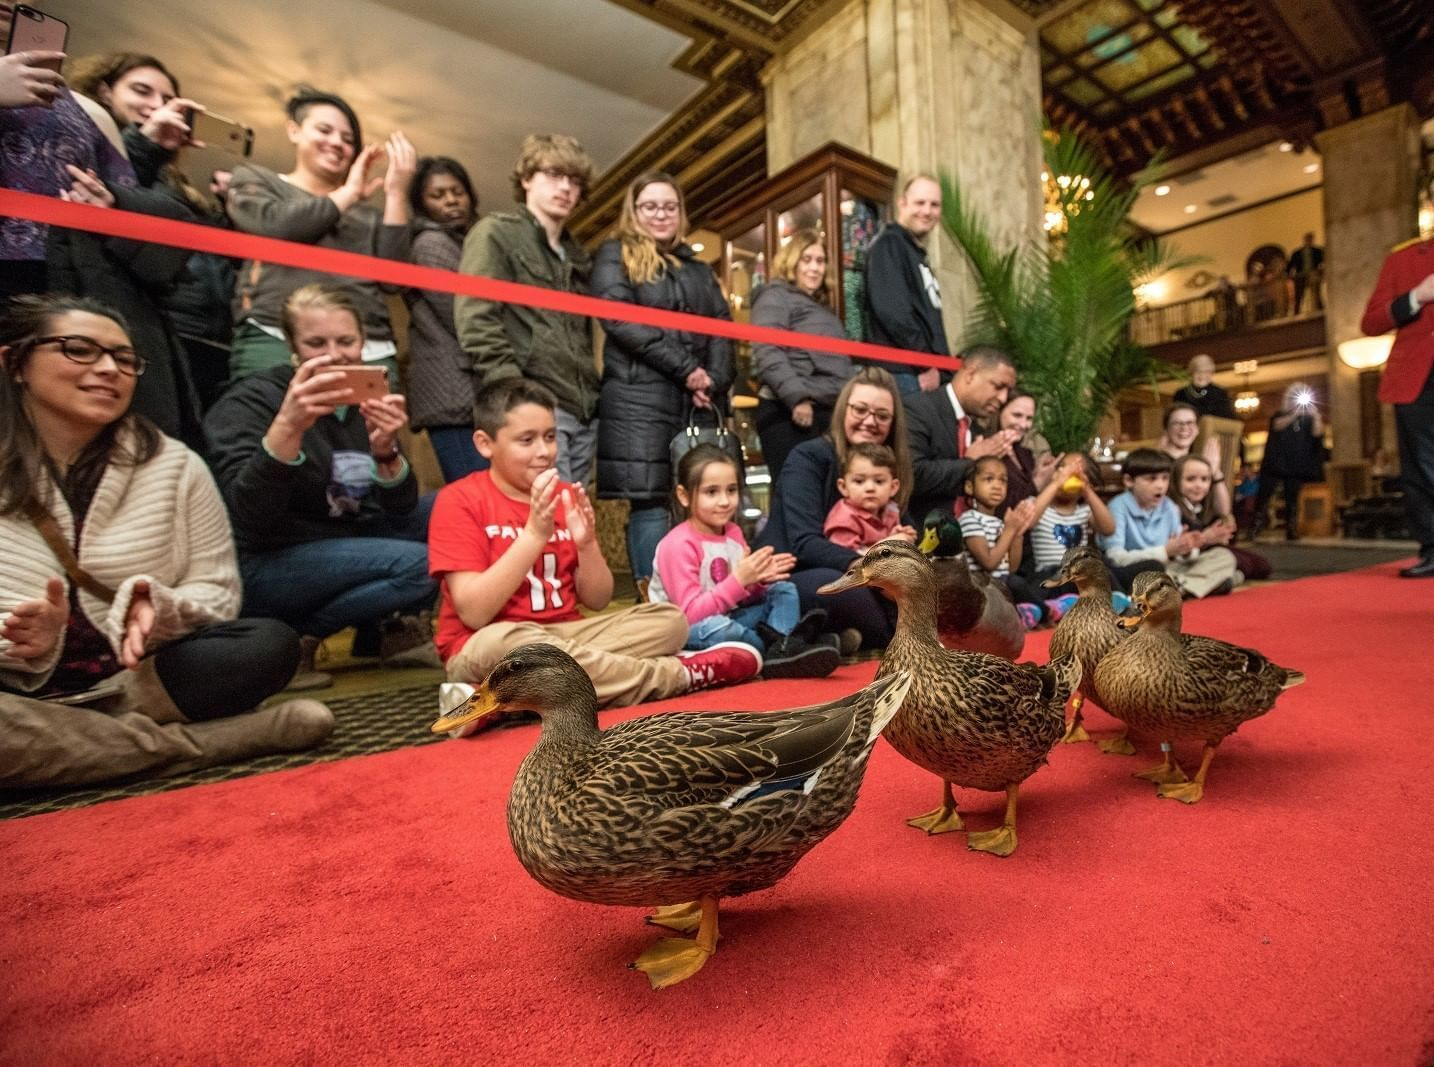 The Peabody Ducks - Duckmarch